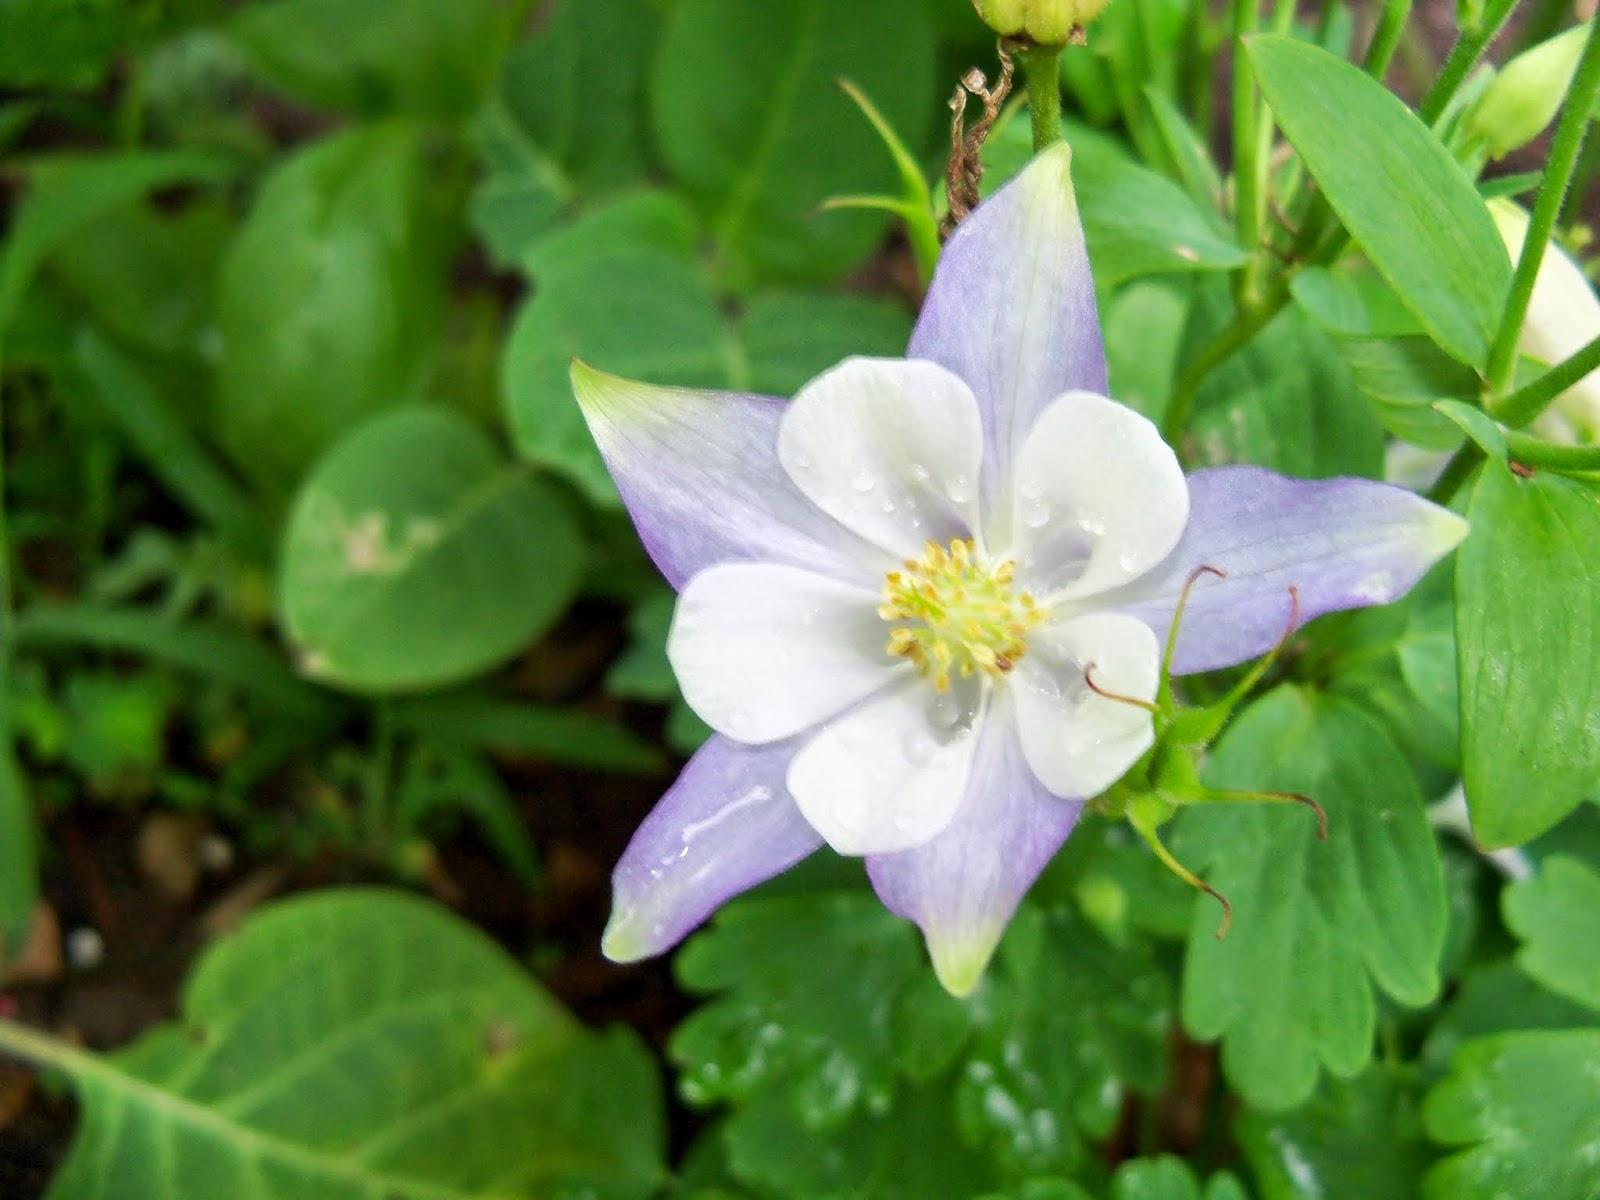 Gardening 2014 - 116_1844.JPG